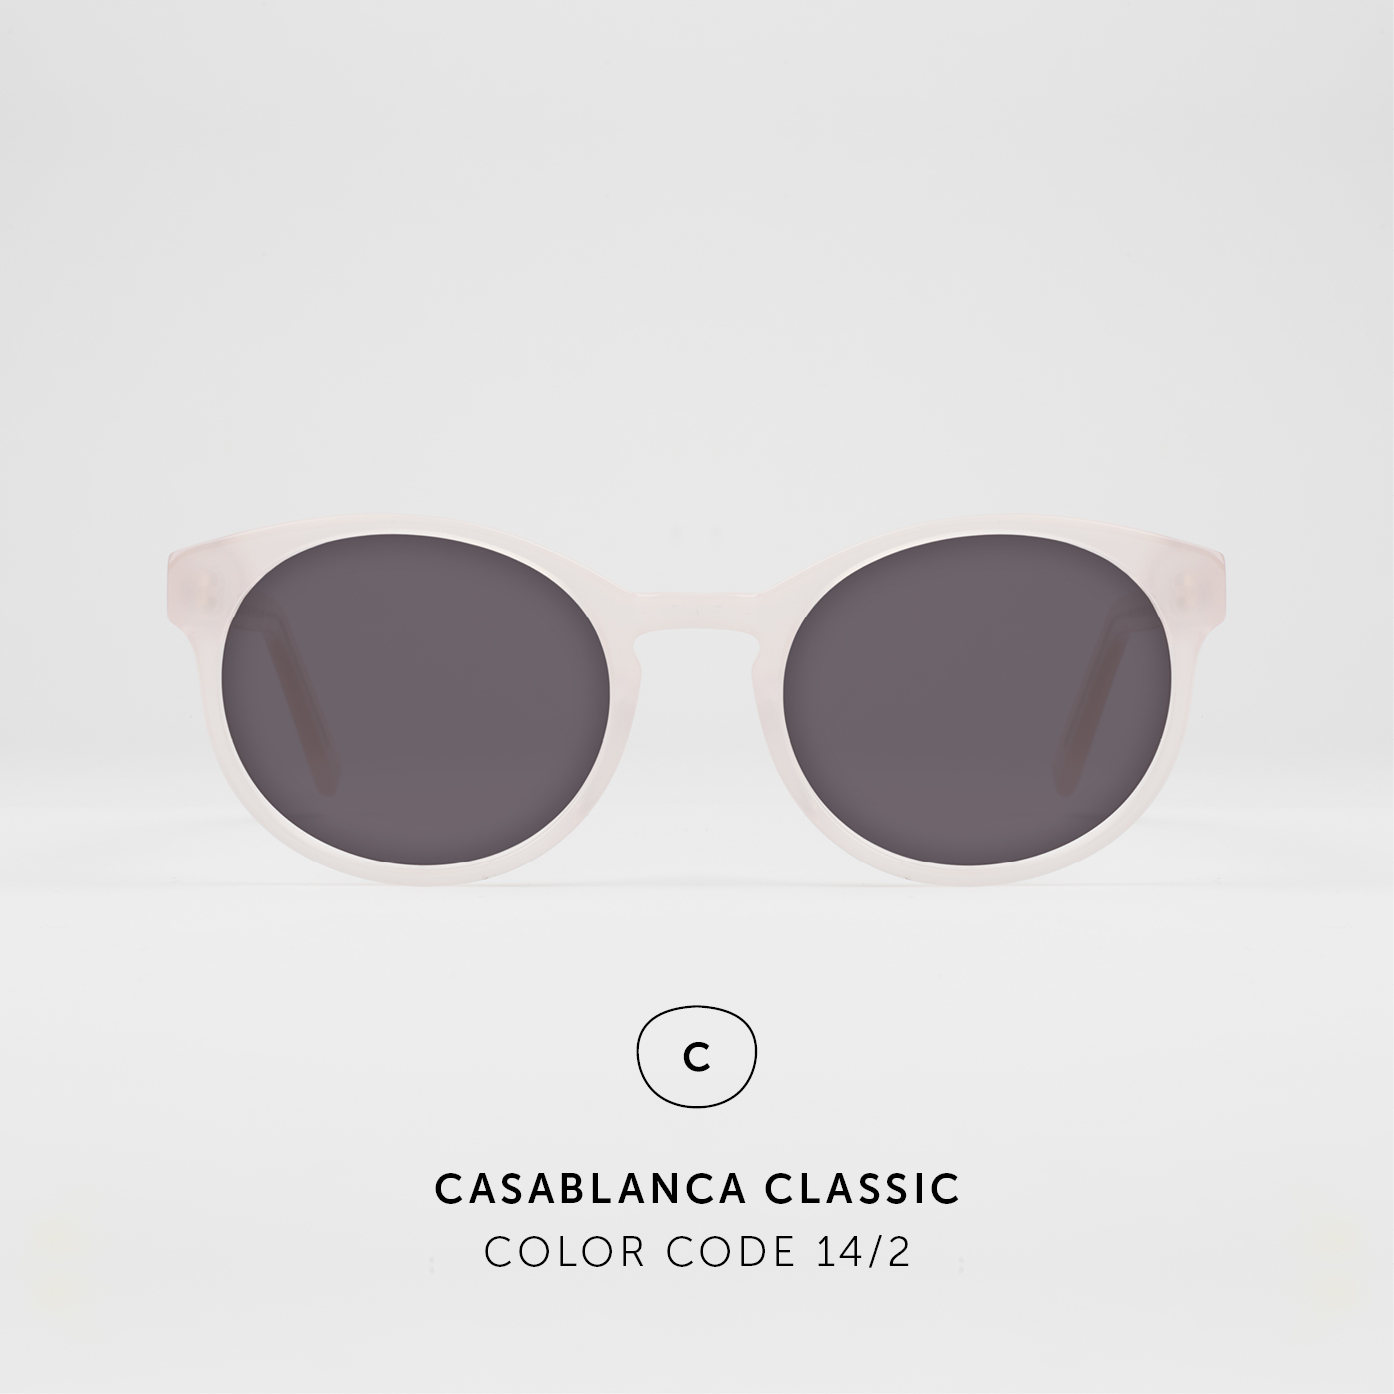 CasablancaClassic34.jpg